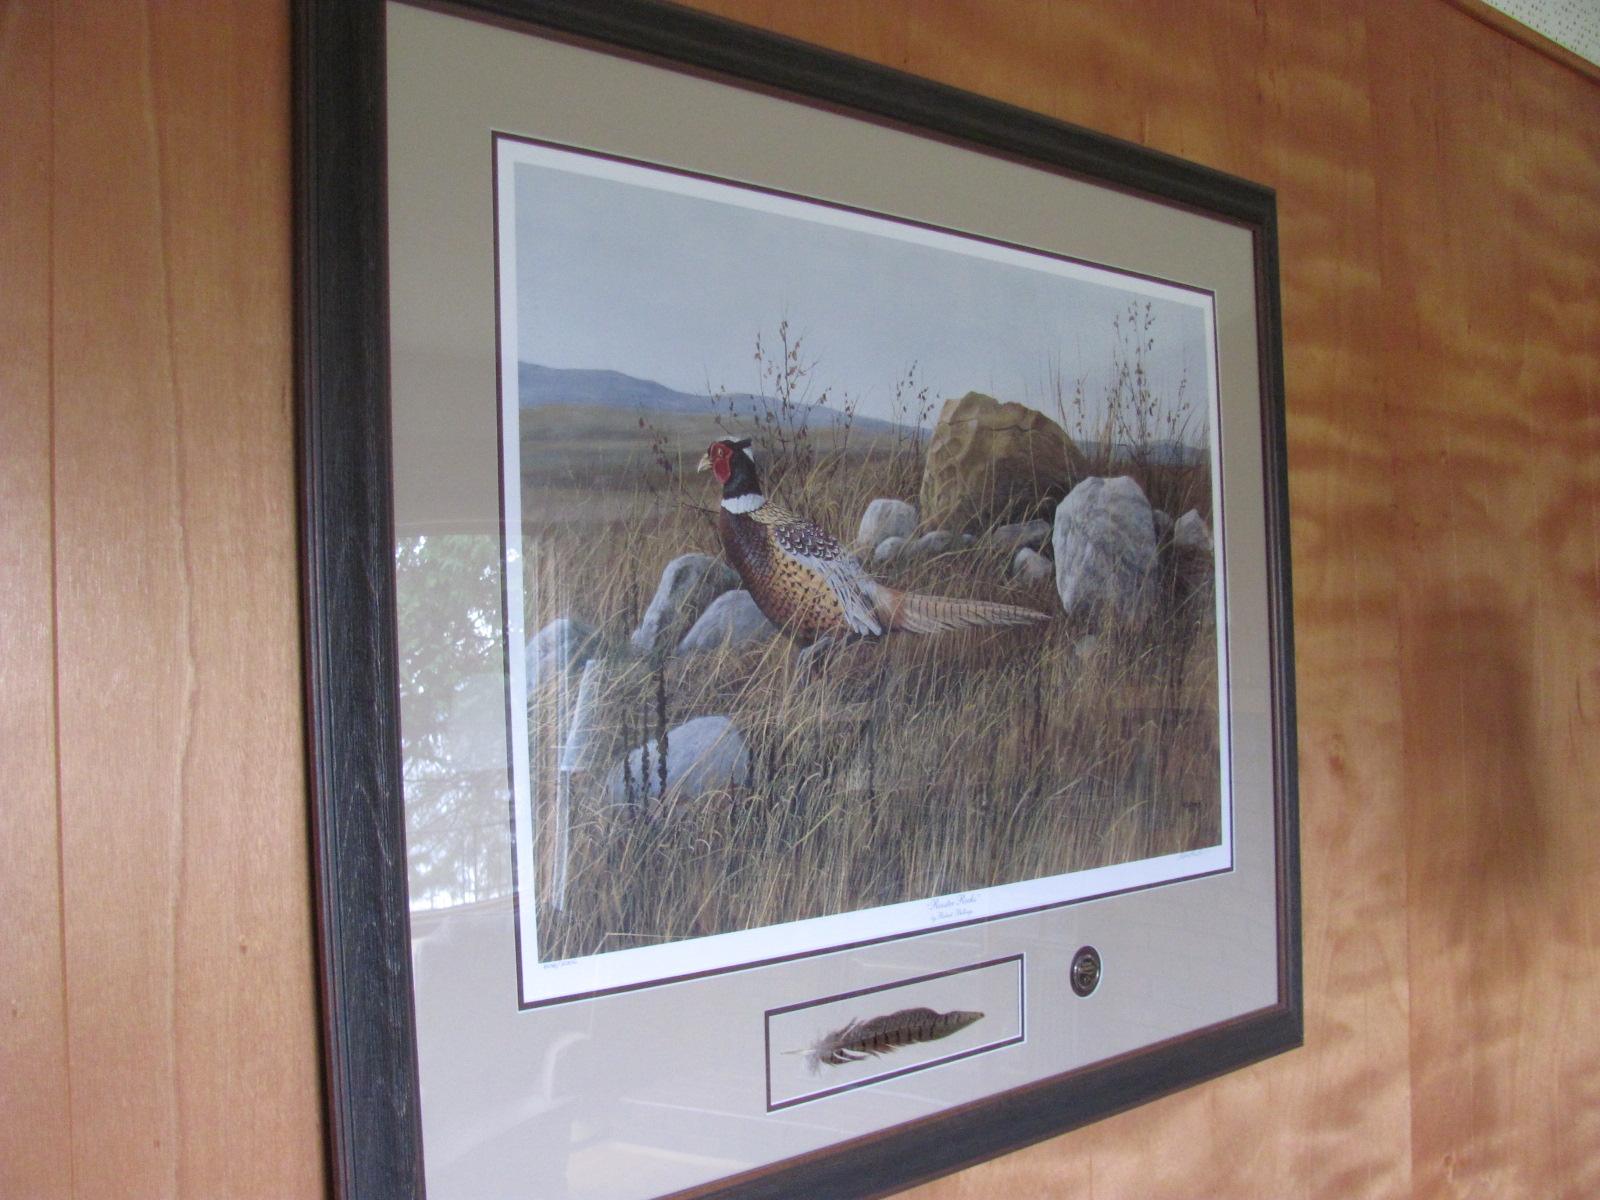 de4cac326a Bondi Resort BLOG  Ducks Unlimited. Wall space  Not so Much...